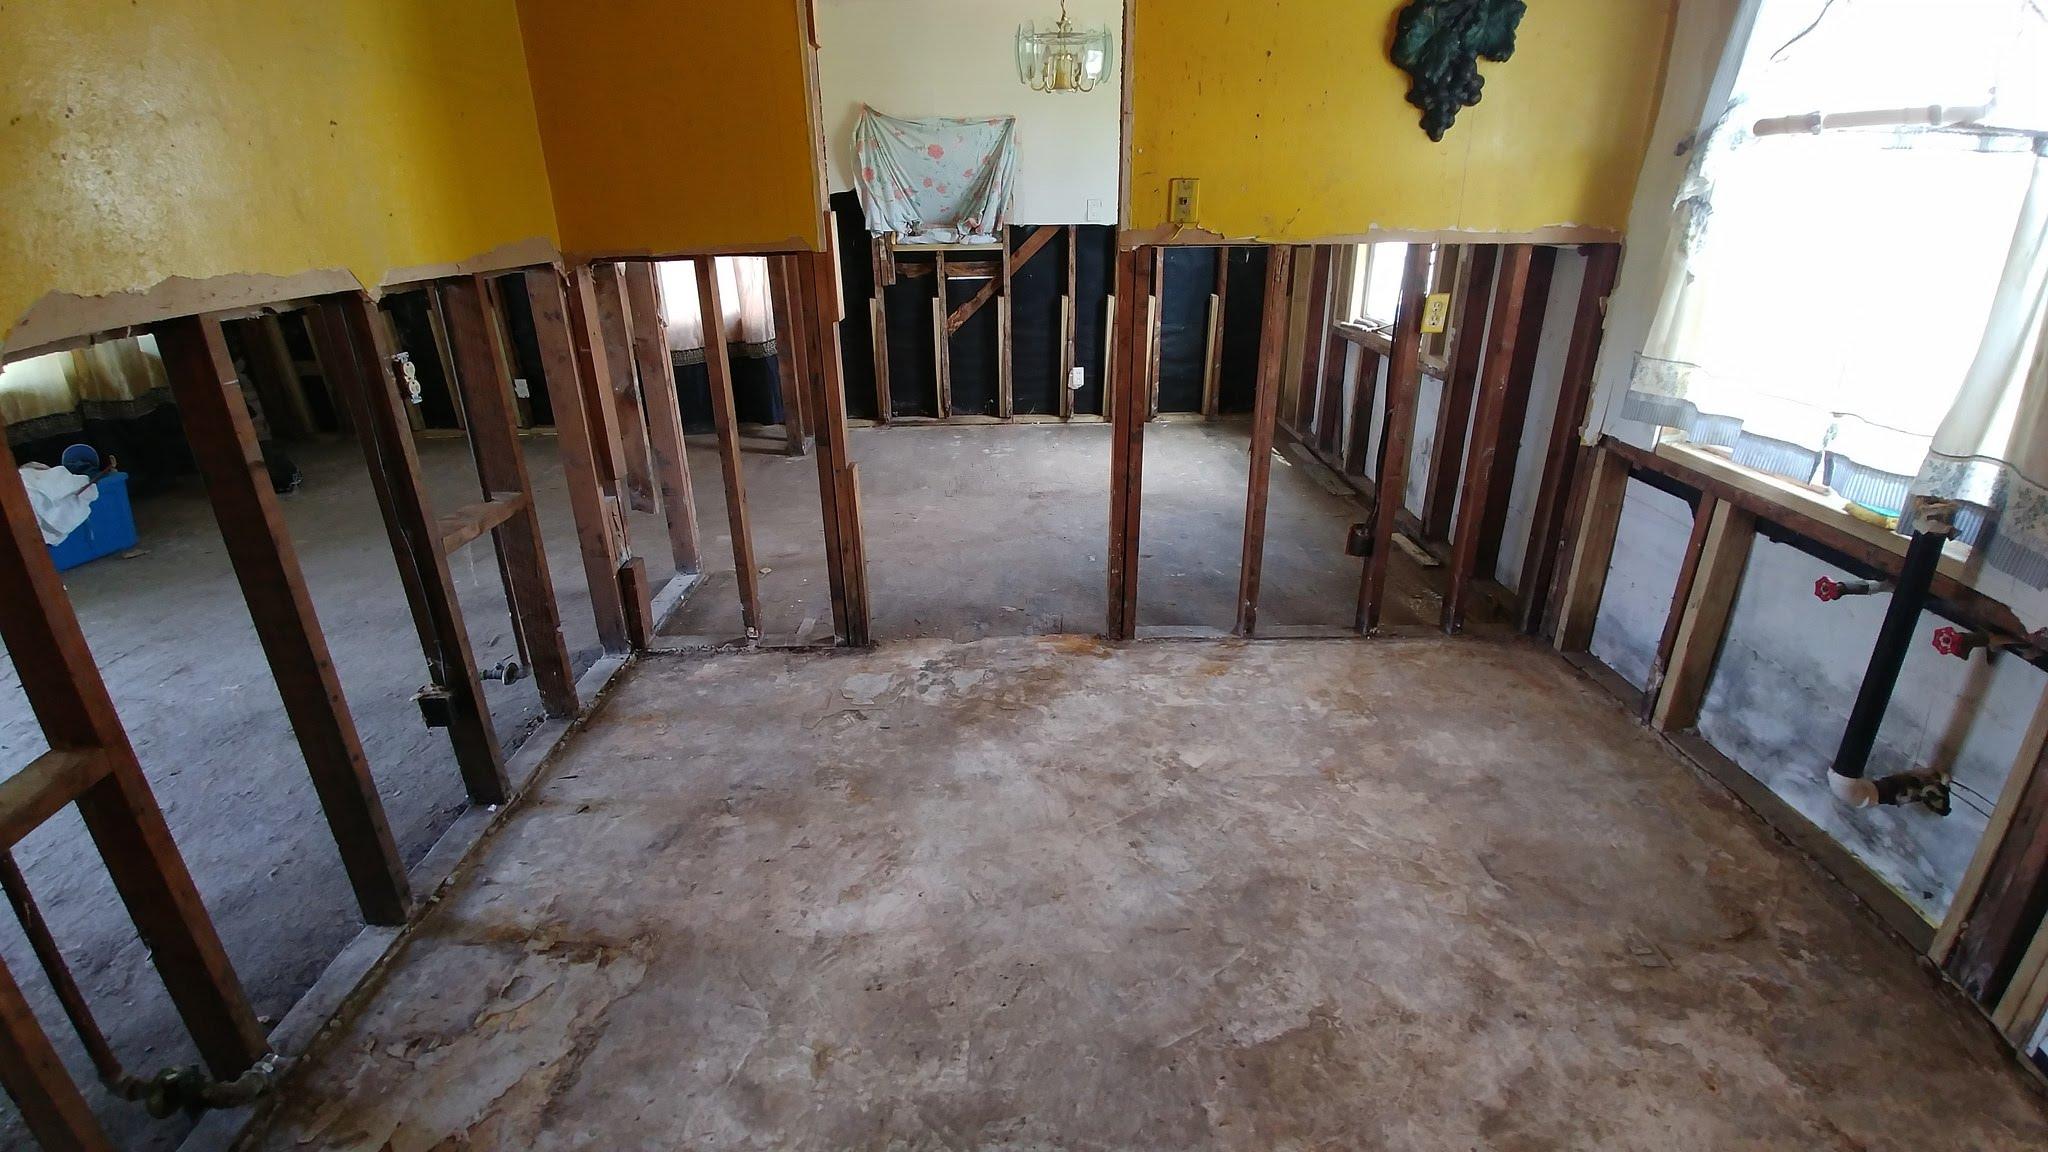 IRONMAN Texas | Rebuilding Together - IRONMAN Foundation